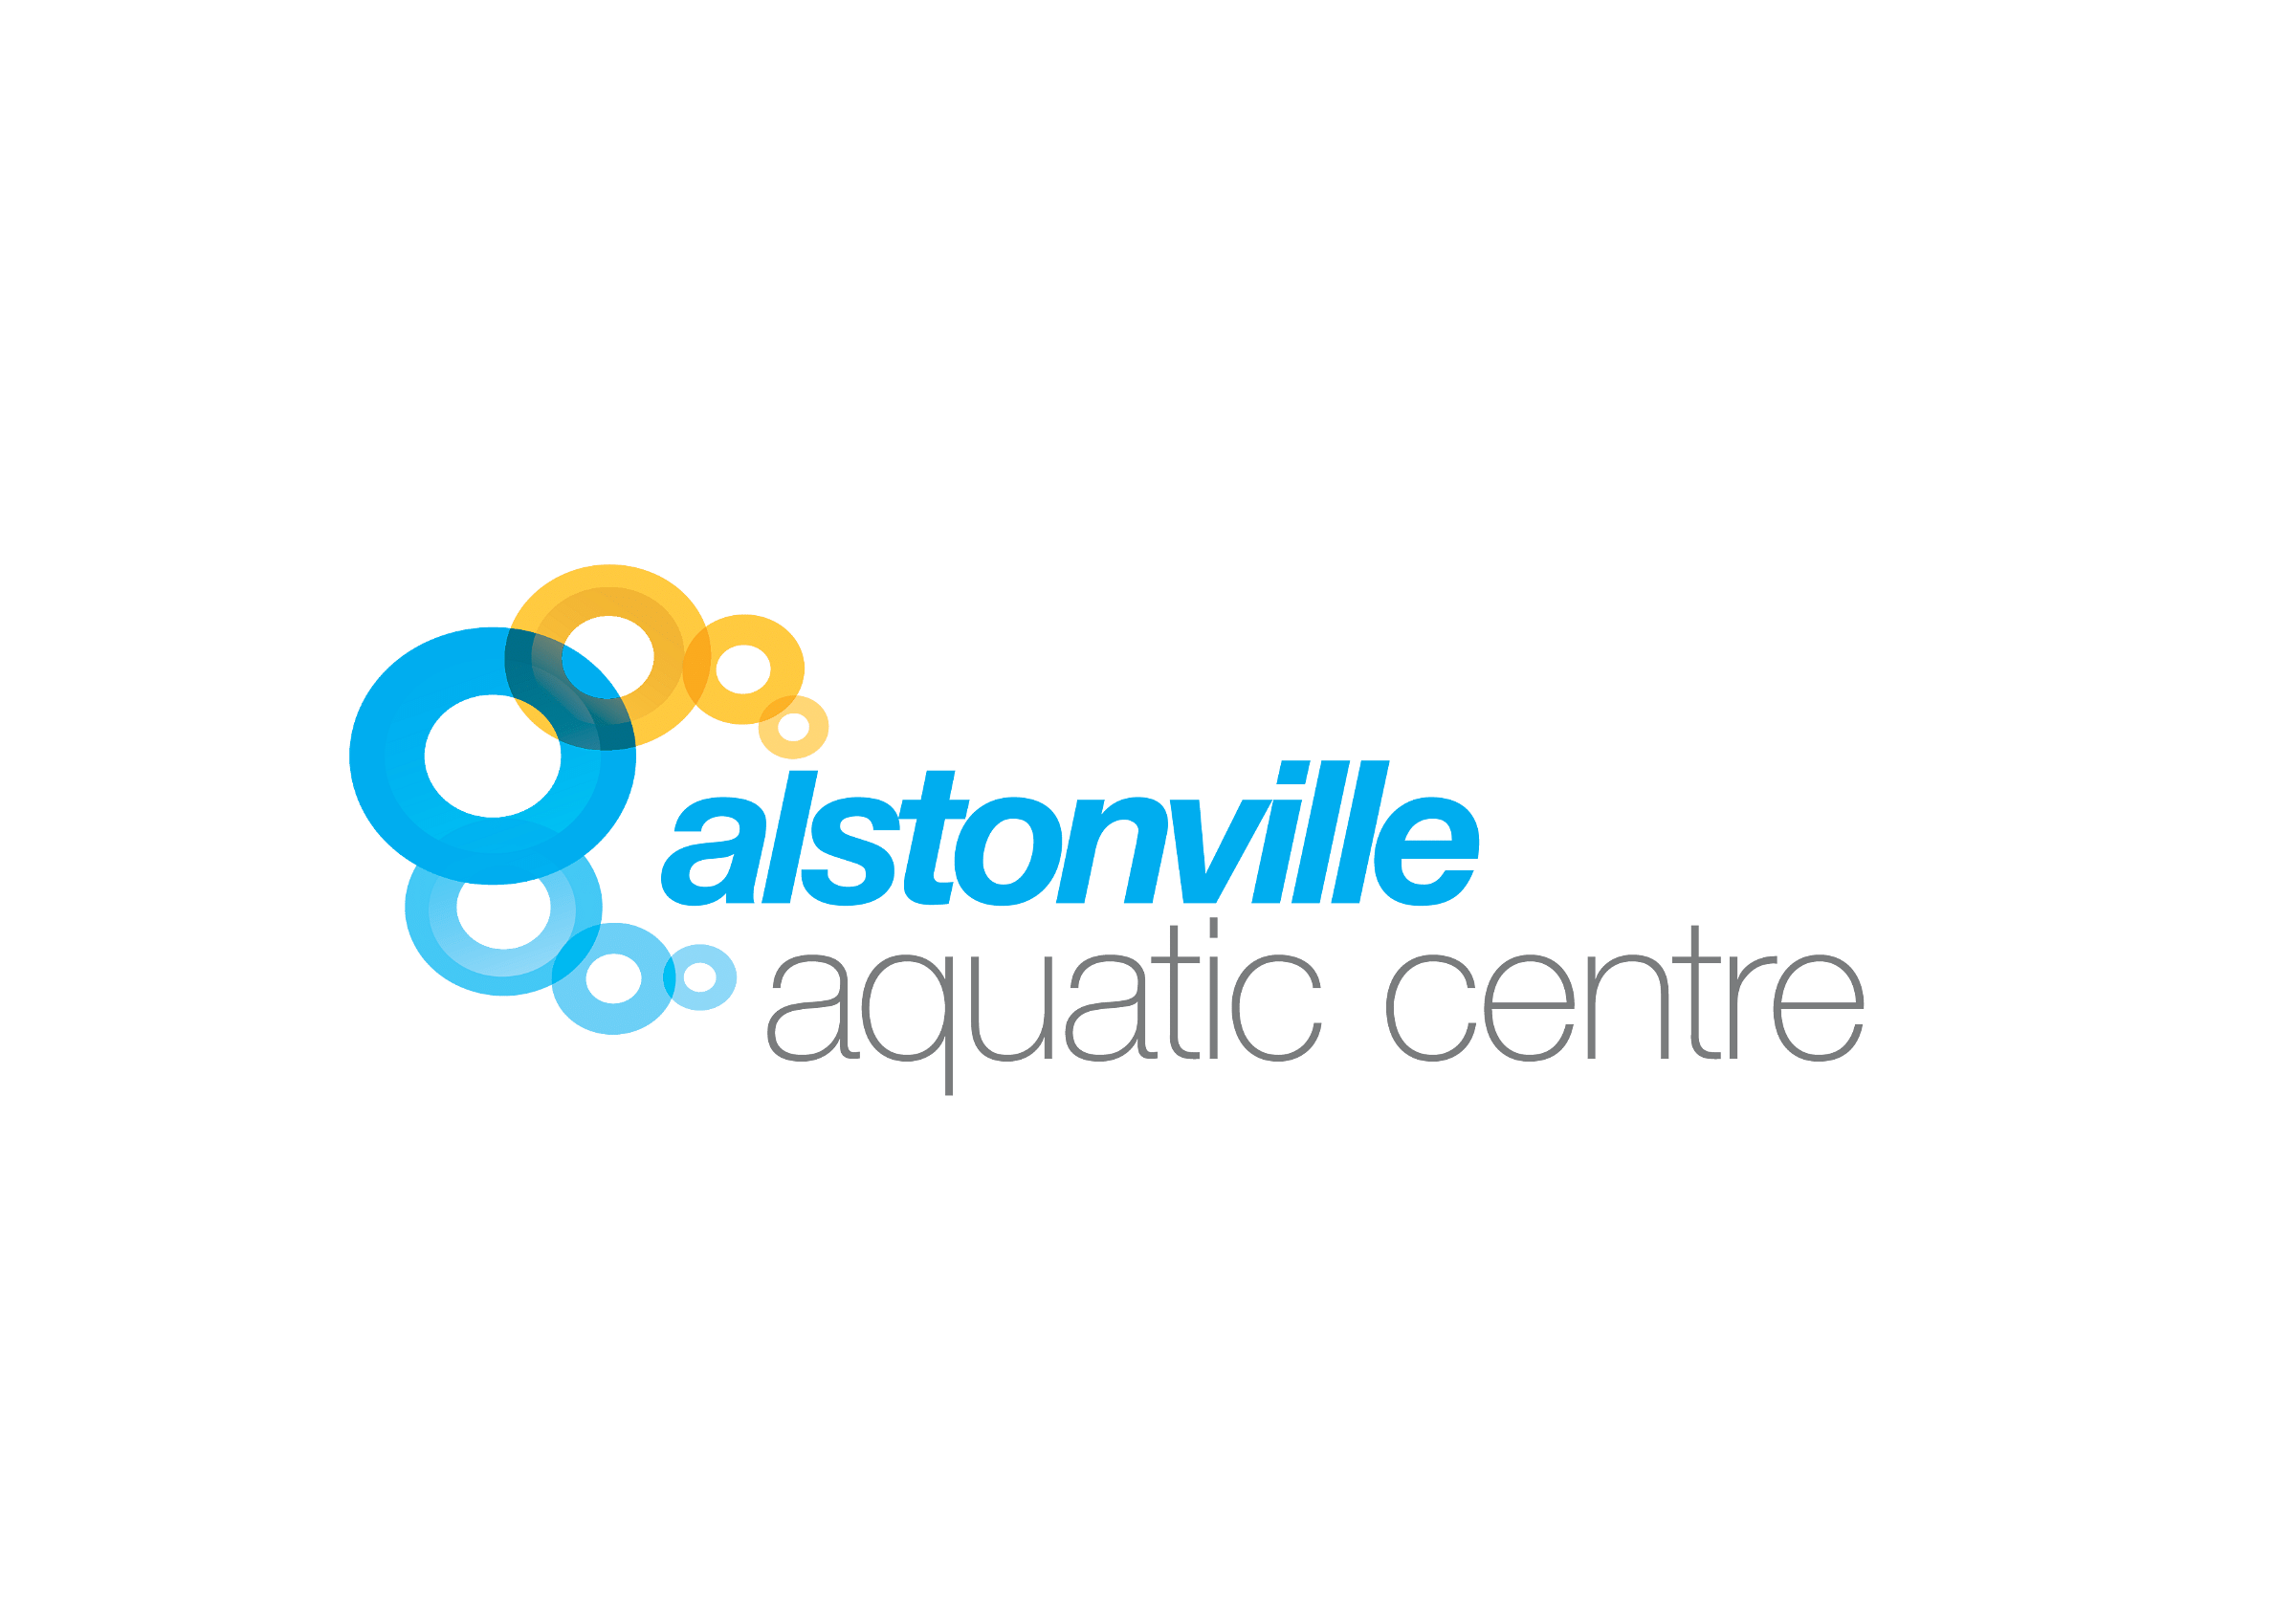 Alstonville aquatic centre logo